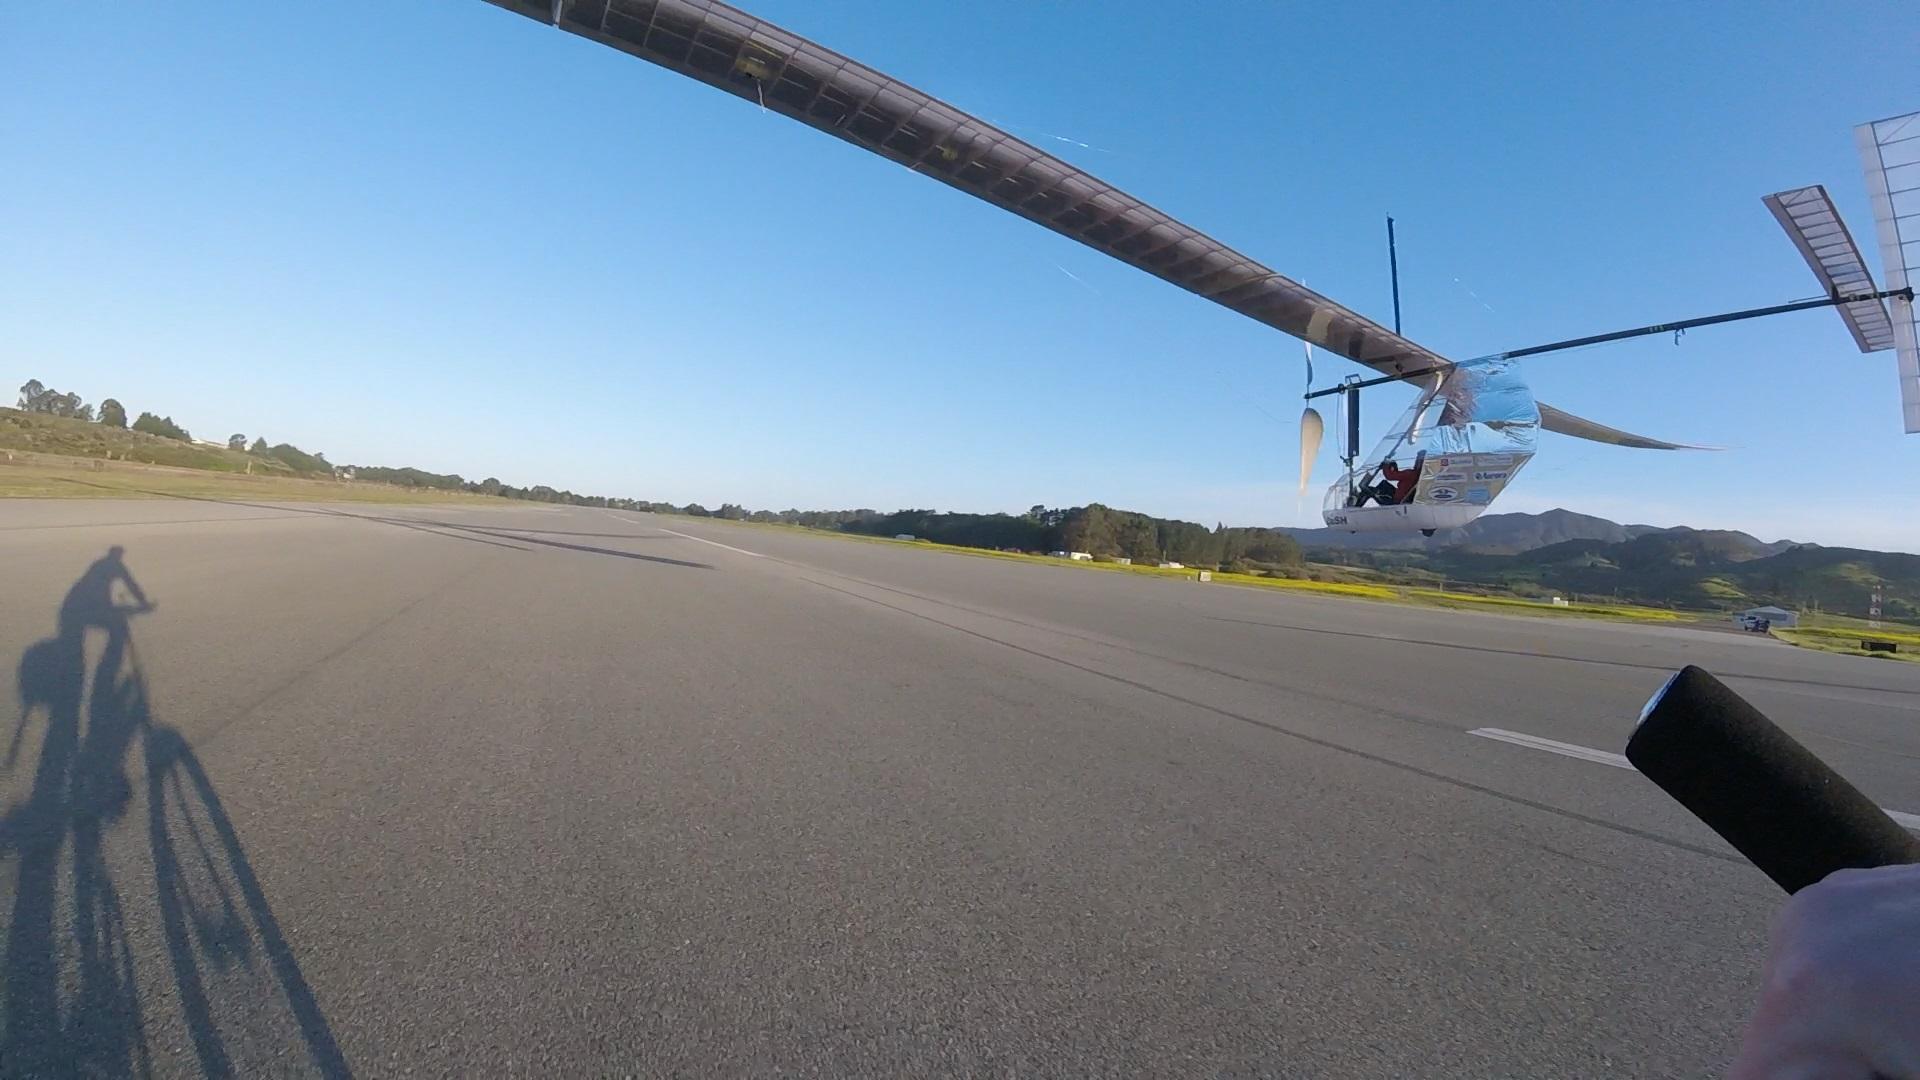 Human Powered Aircraft Dash